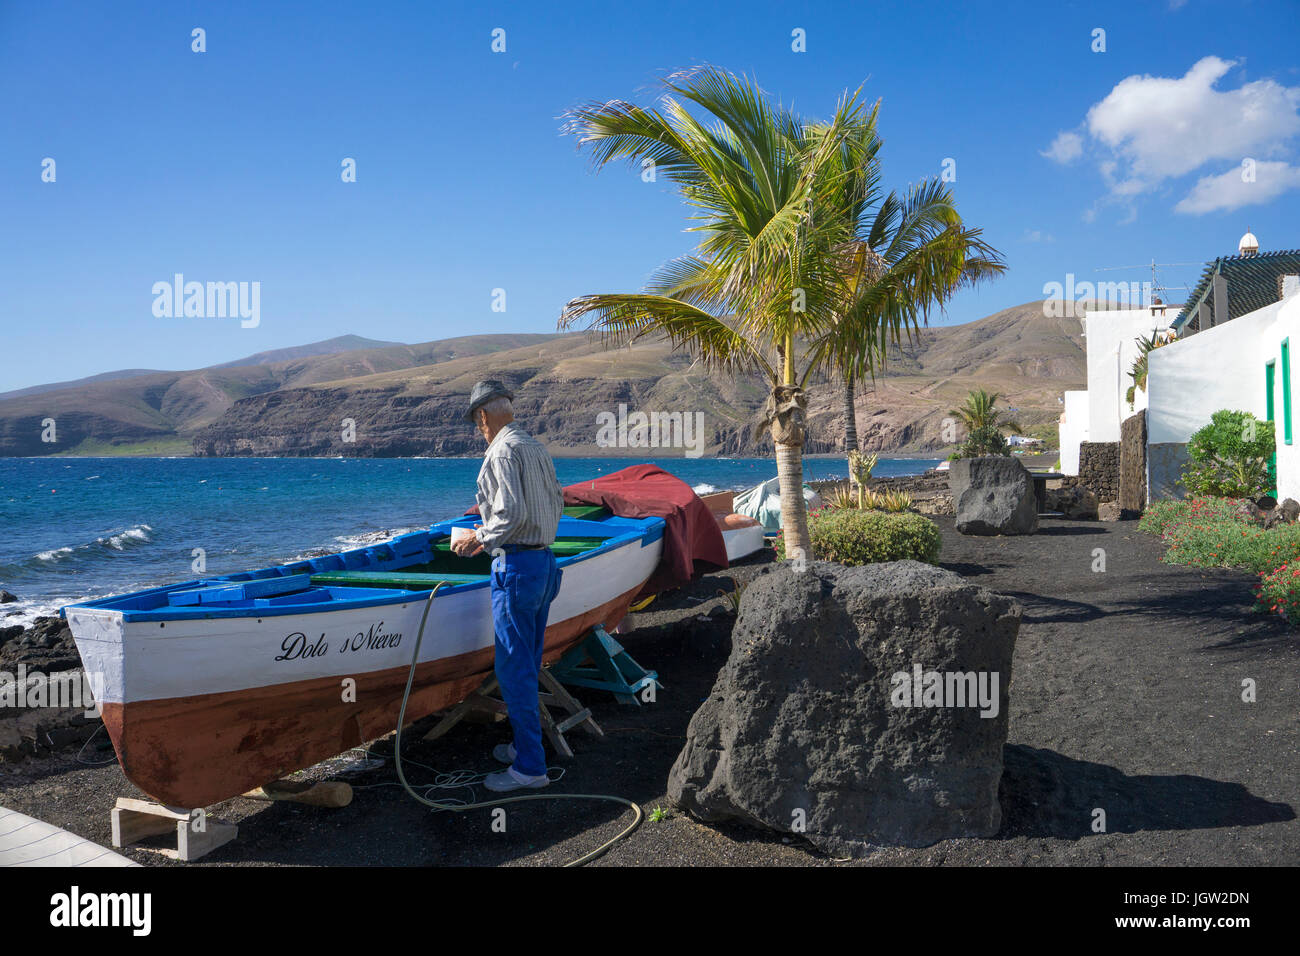 Old fisherman work on his boat at beach, fishing village Playa Quemada, Lanzarote island, Canary islands, Spain, Stock Photo